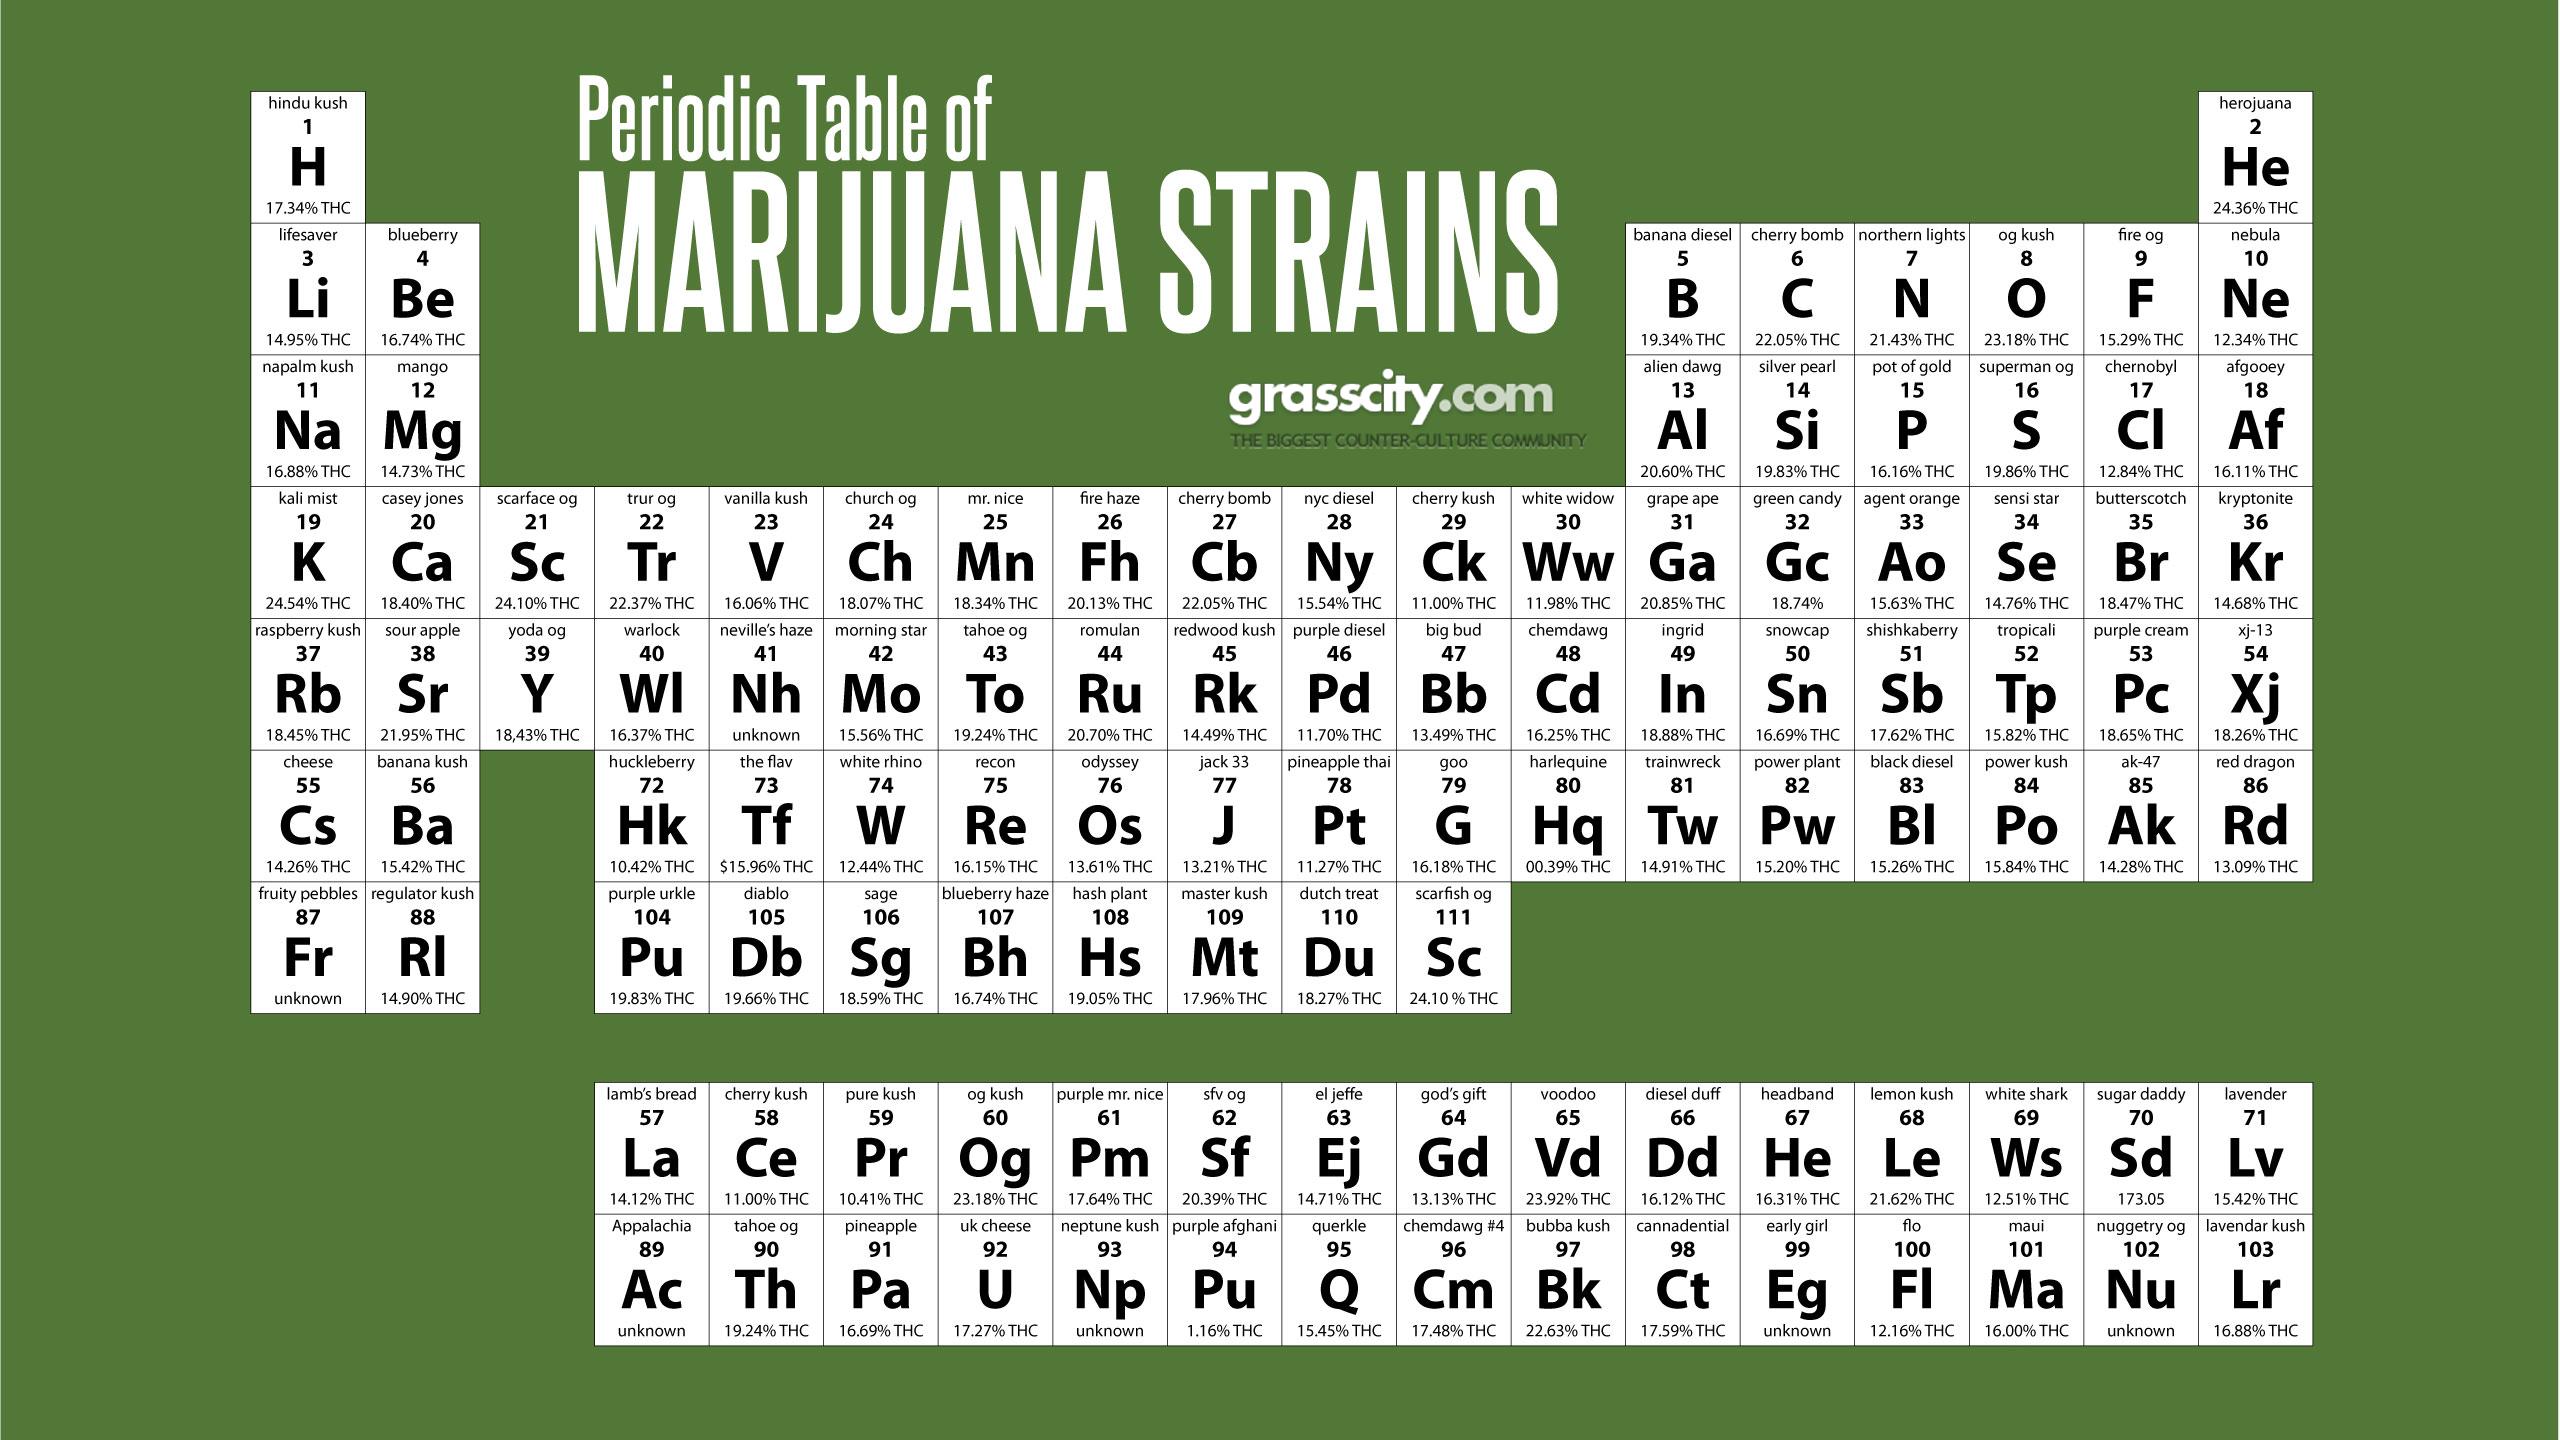 Marijuana Strains Periodic Table Grasscity Forums